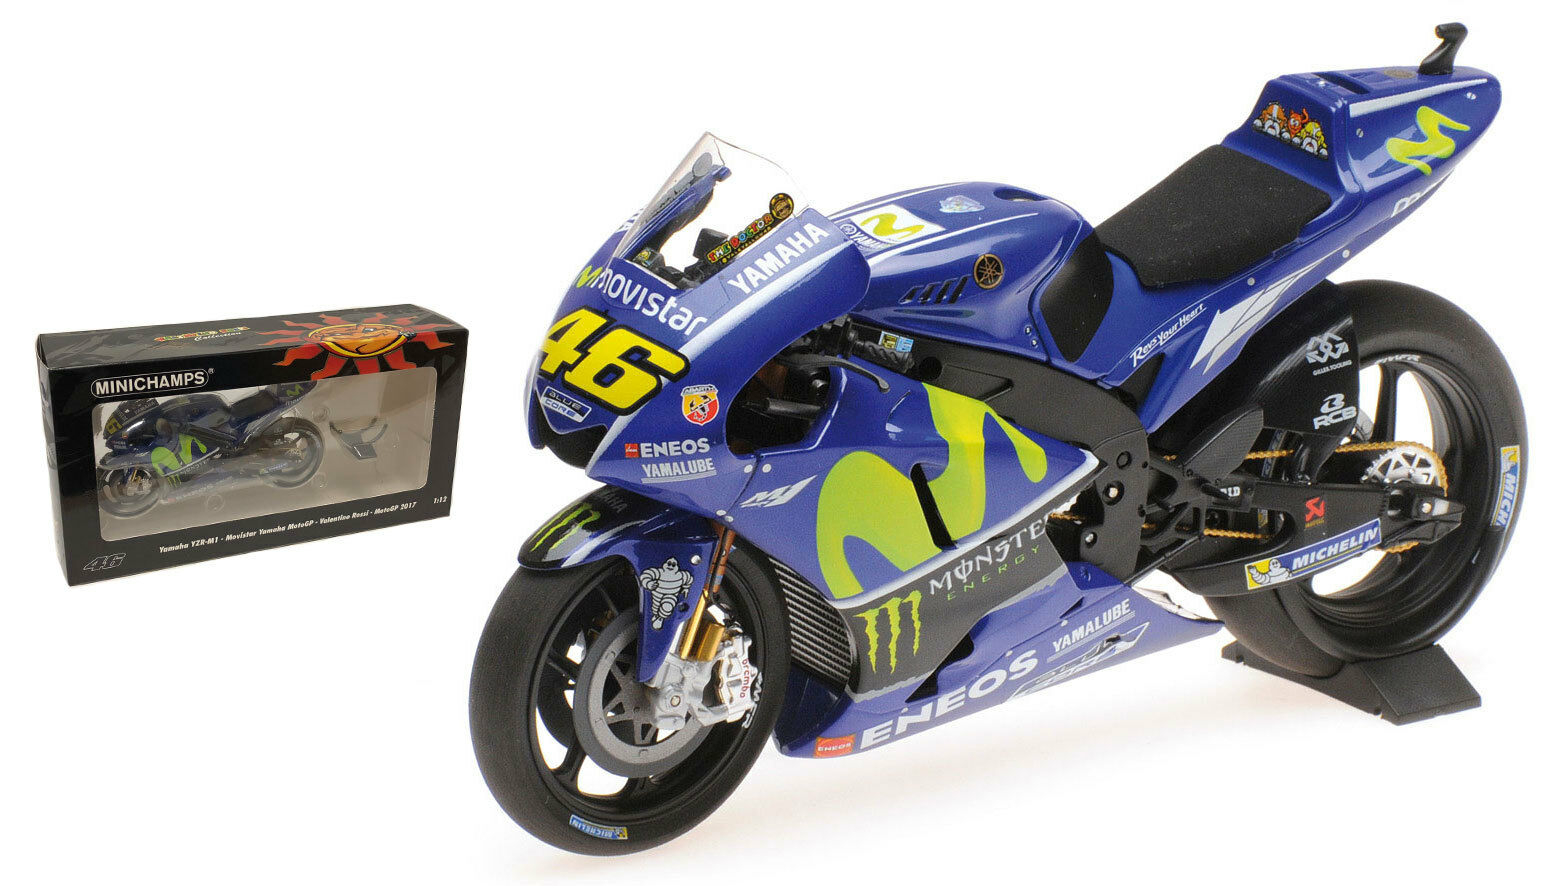 Minichamps MotoGP Yamaha YZR-M1 2017-escala 1 12 de Valentino Rossi